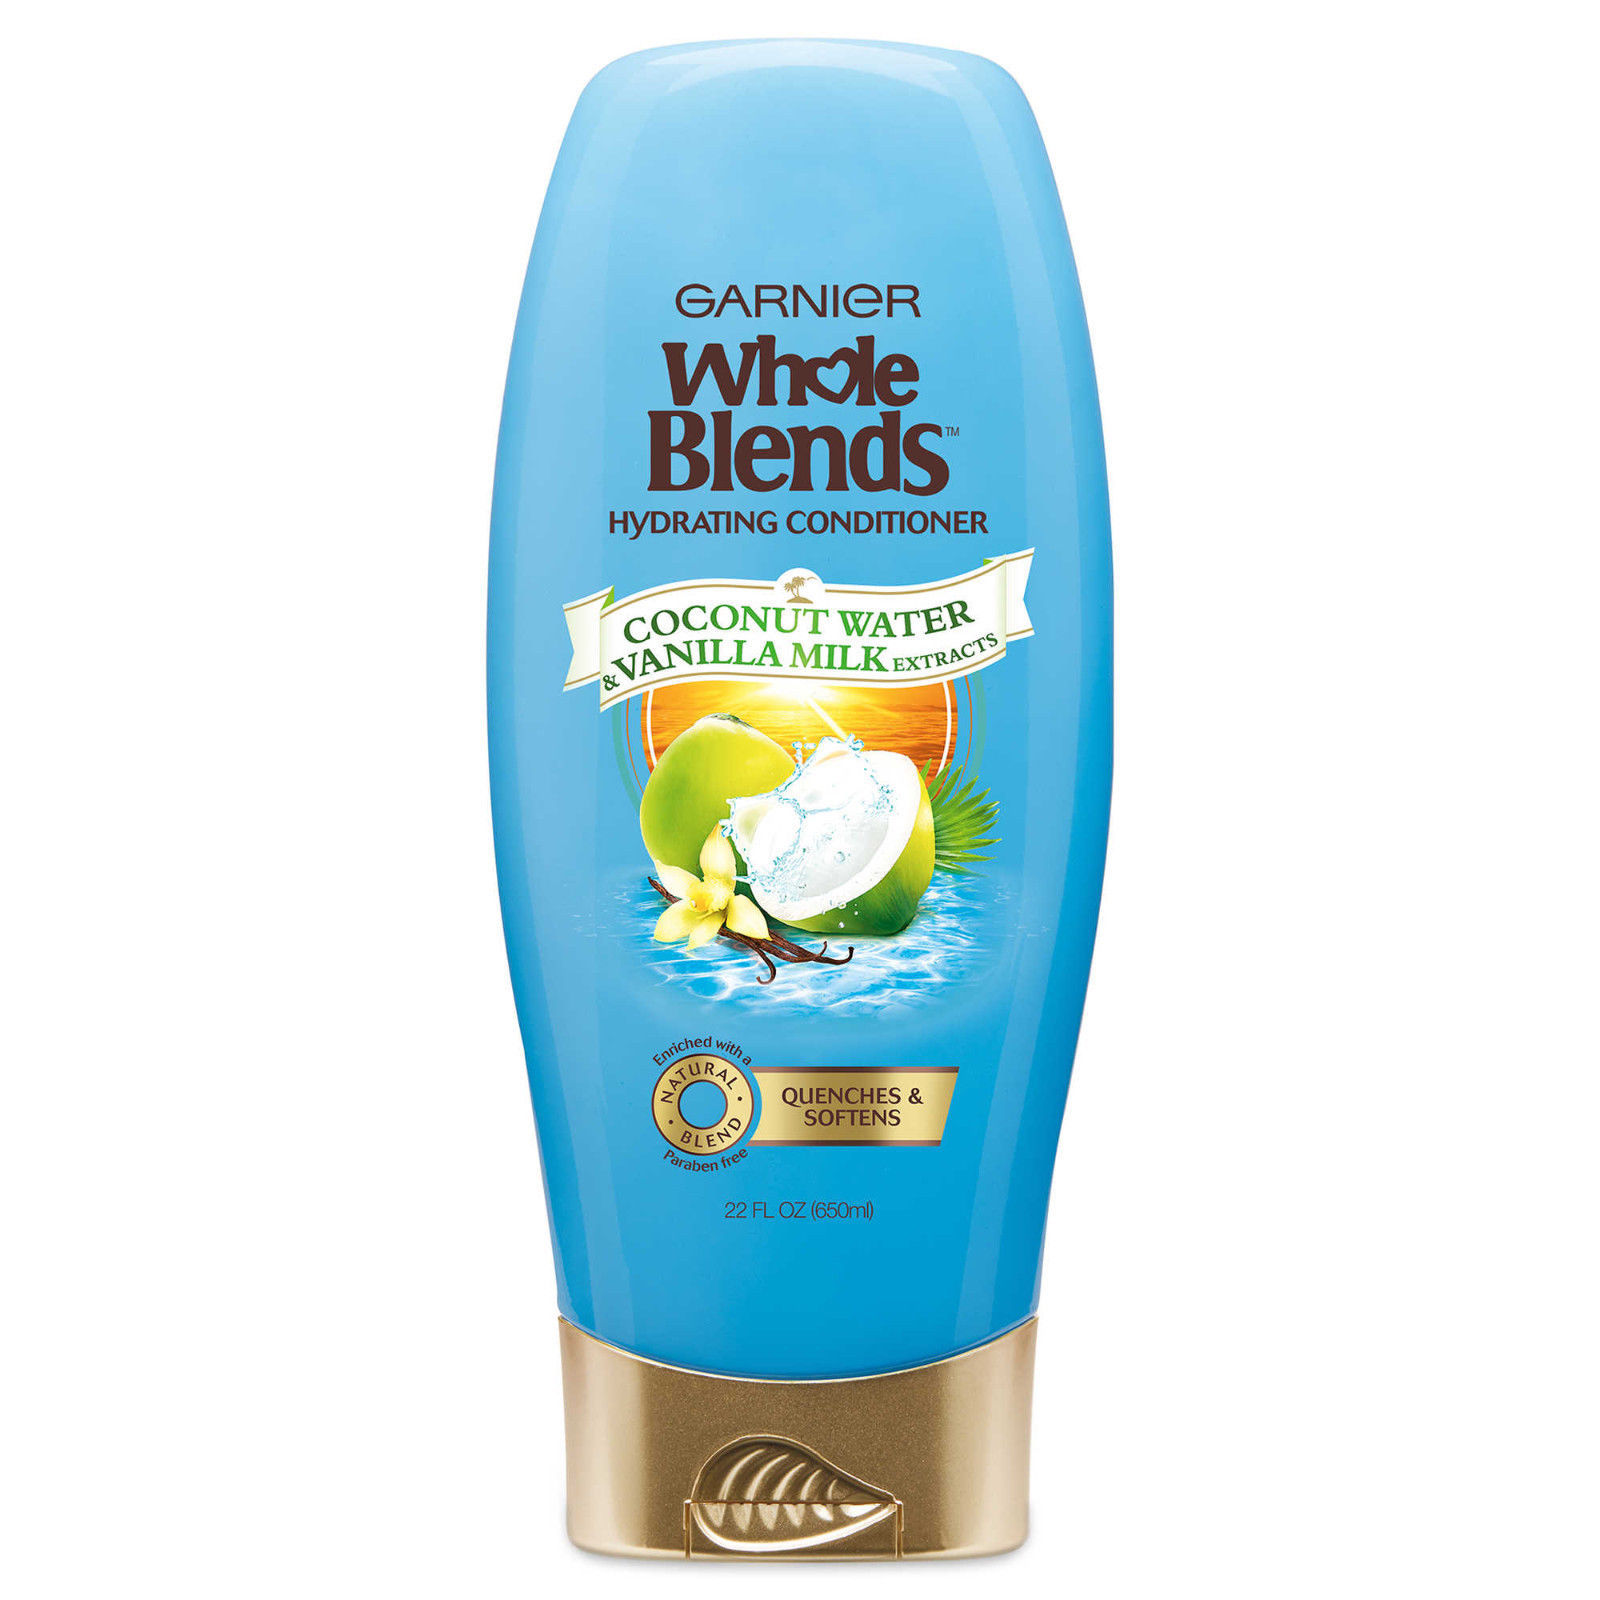 Garnier Neril Anti Dandruff Shield Hair Tonic 200 Ml Daftar Harga Loss Guard Original 200ml Product Code Source